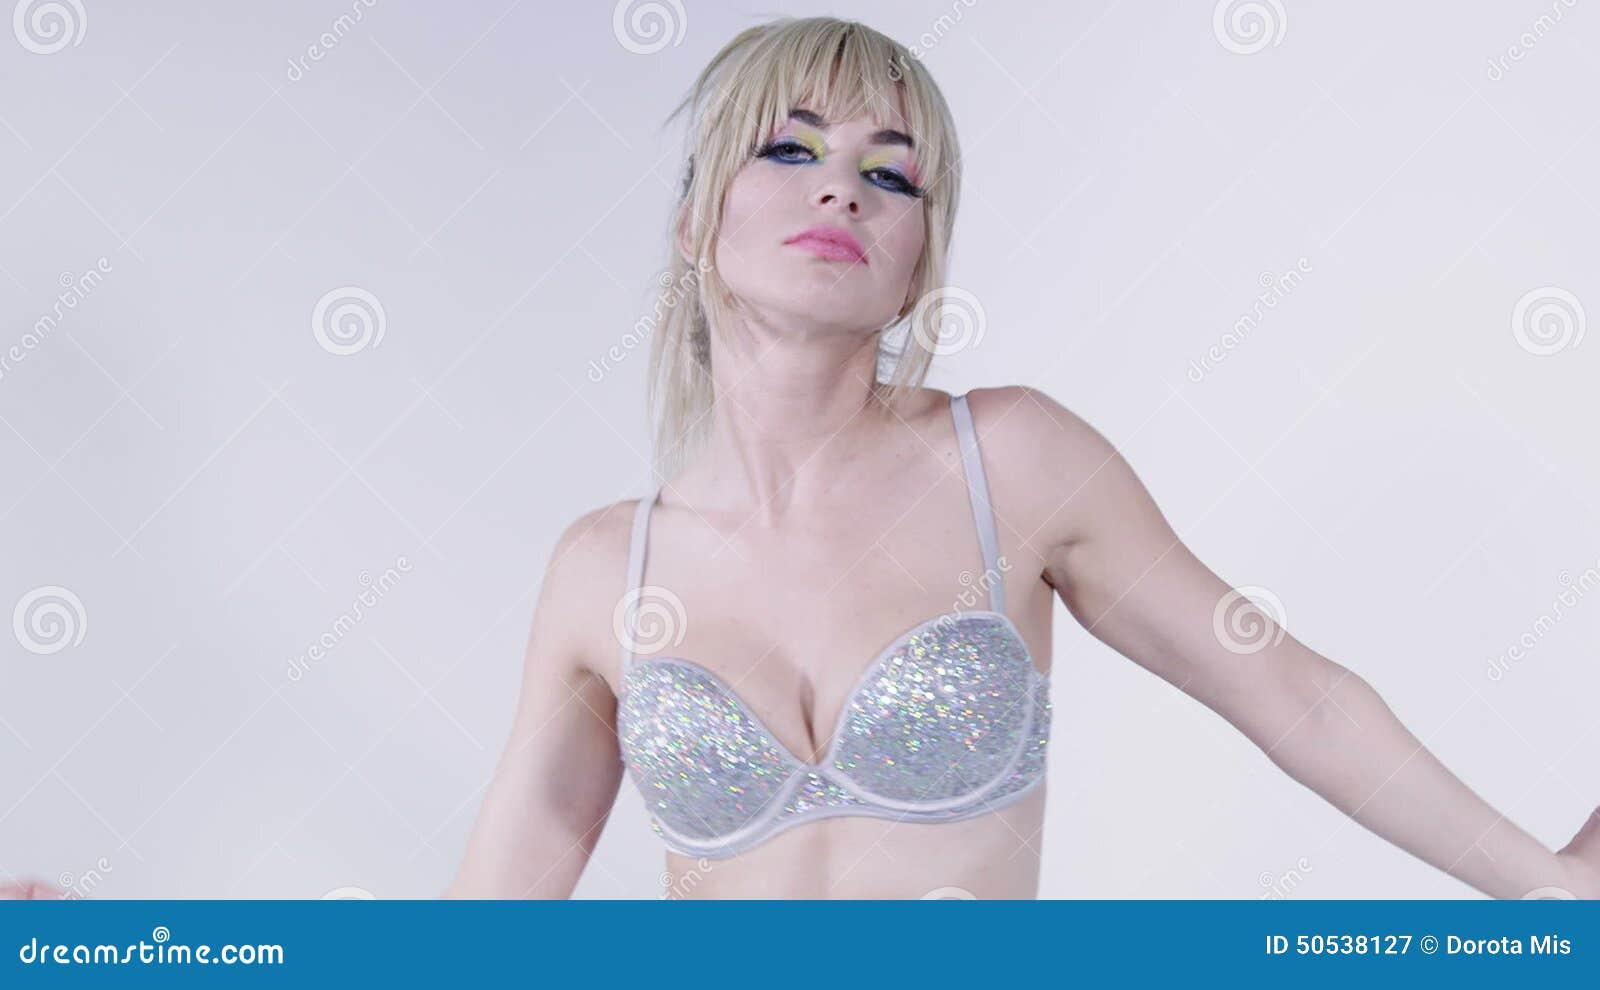 Wearing bras girls blond sexy